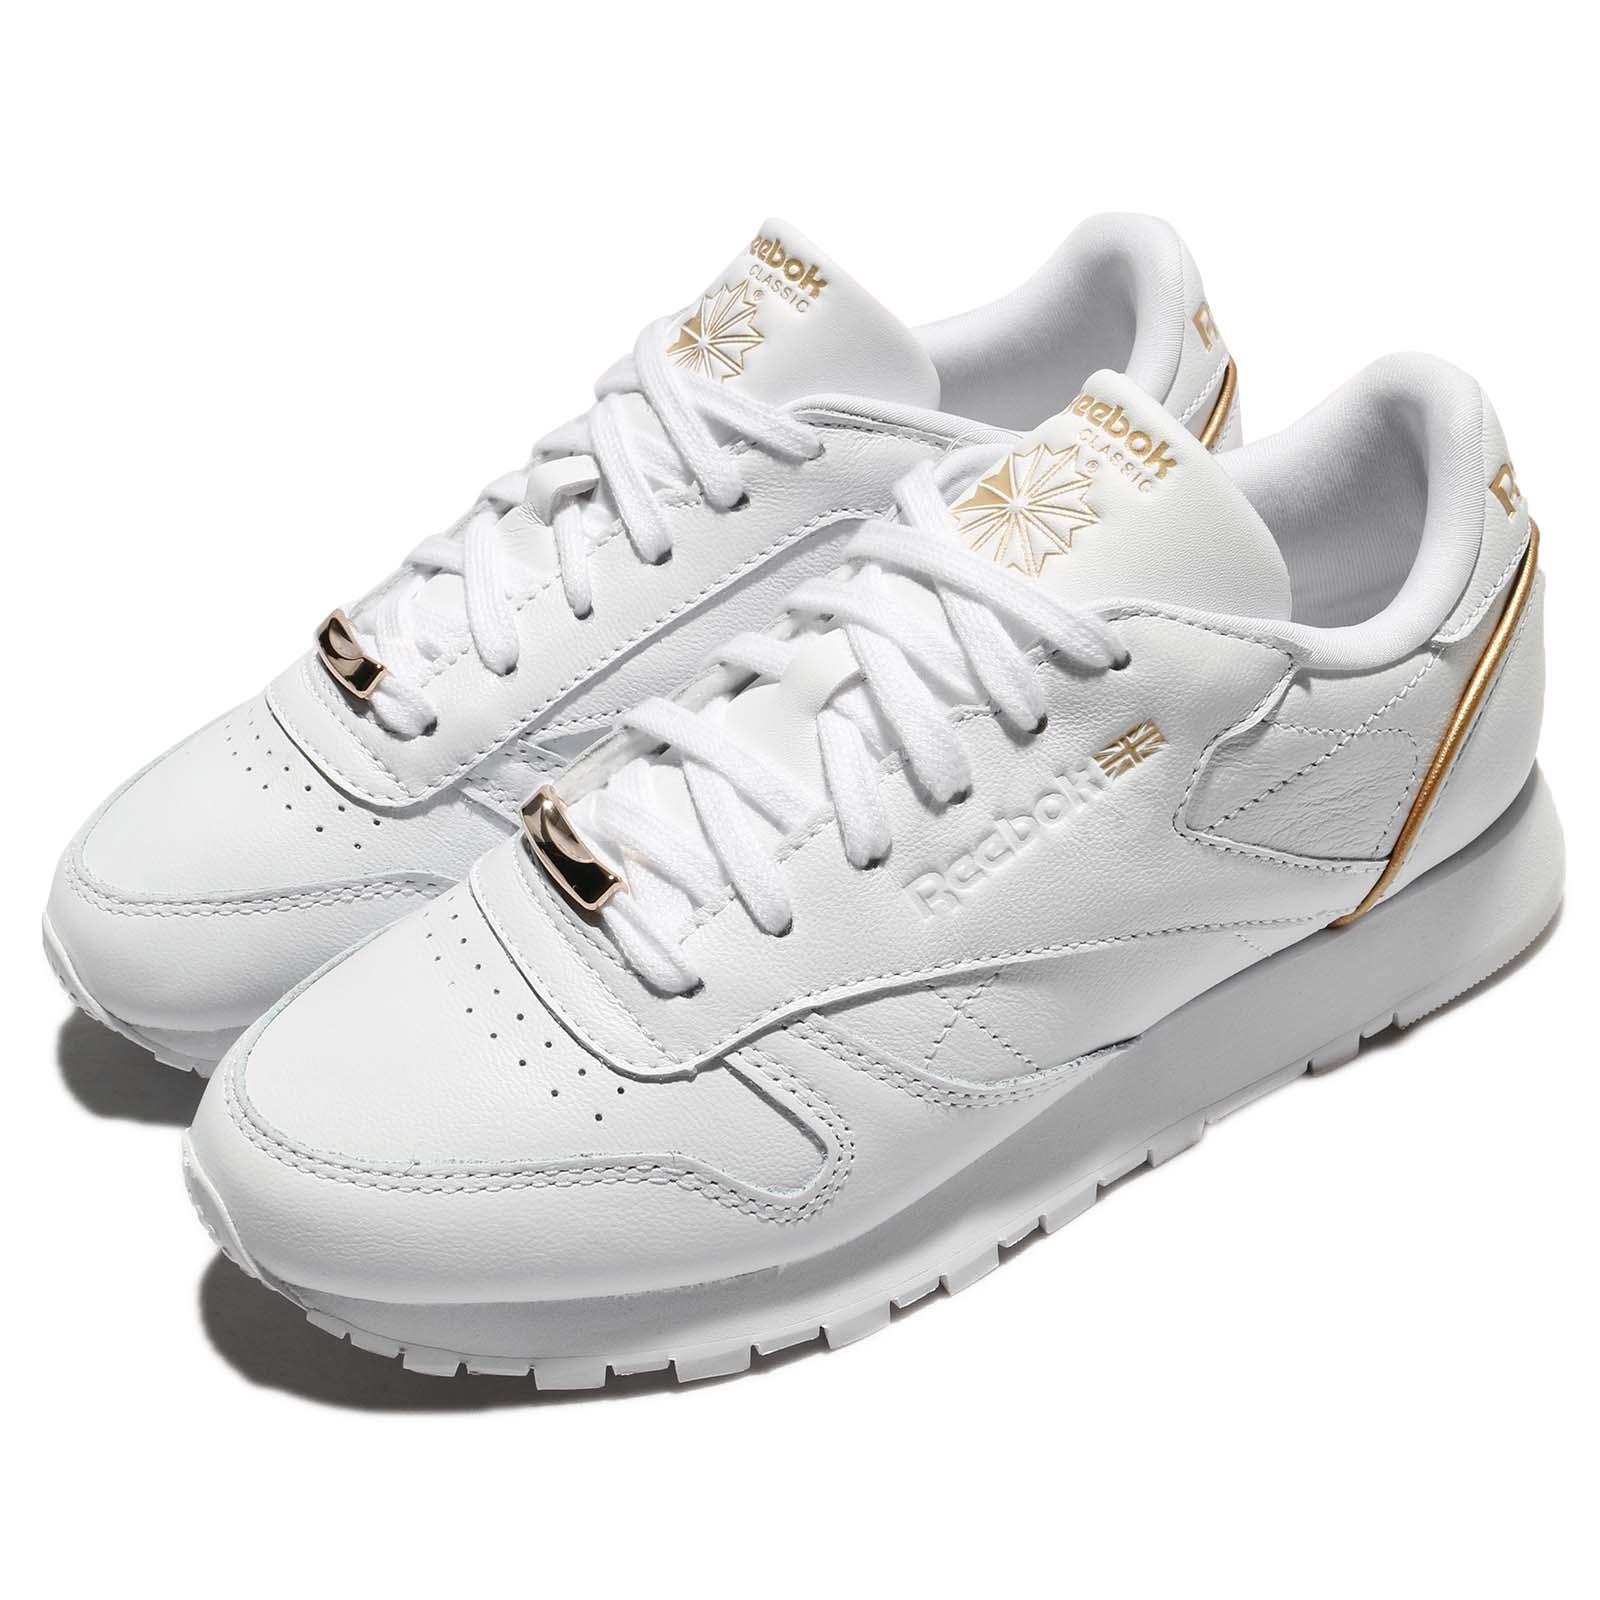 93a306e4b3fd1 Reebok CL LTHR HW Classic Leather White Sleek Met Women Running Shoes BS9878